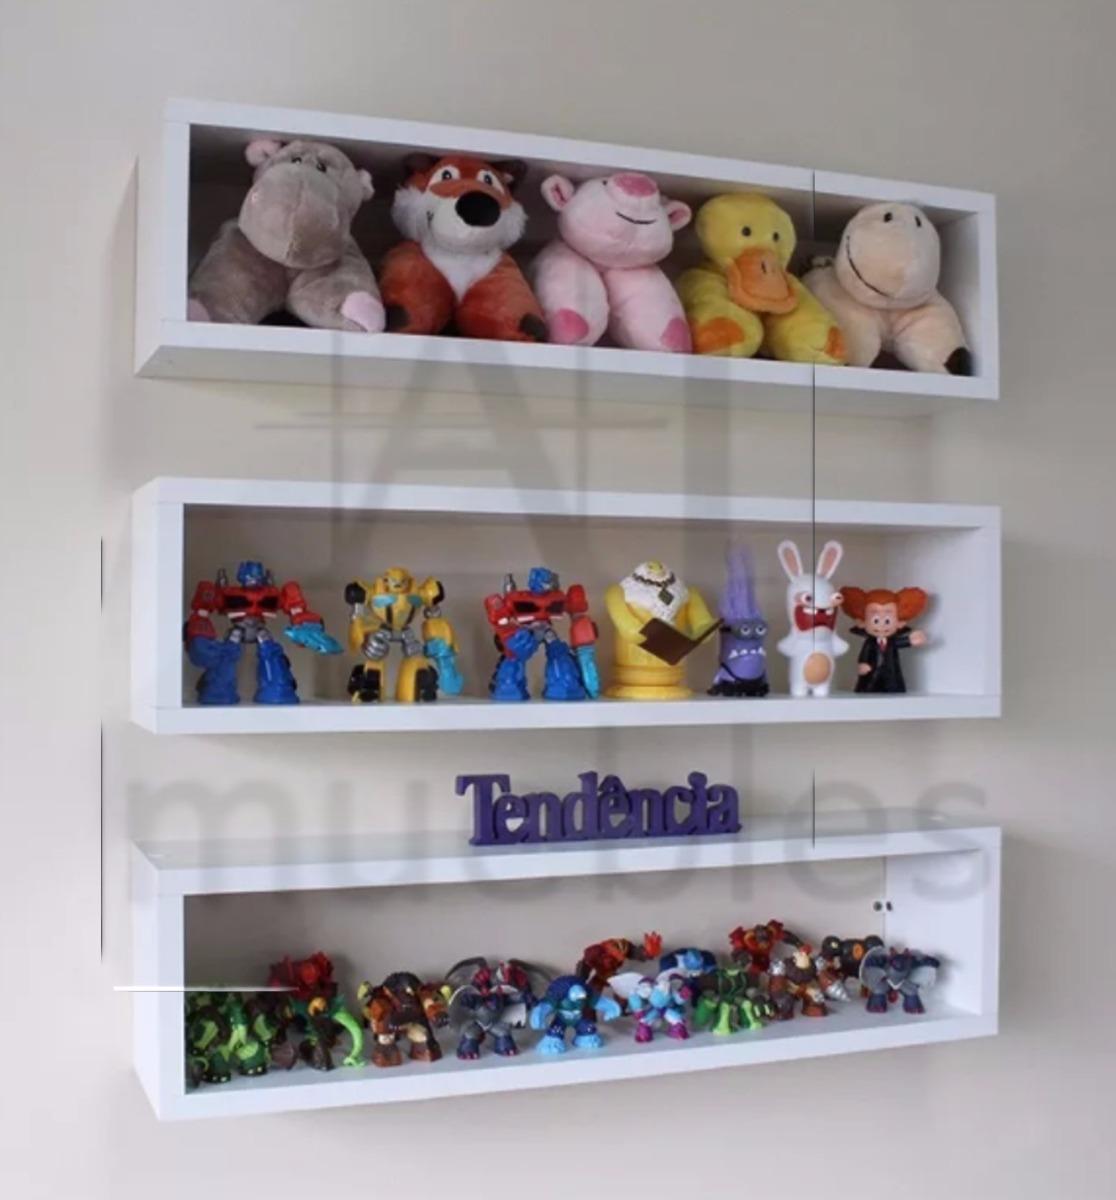 Cubos Laqueados Rectangular Decorativos Infantiles Dormitori  # Muebles Laqueados Infantiles